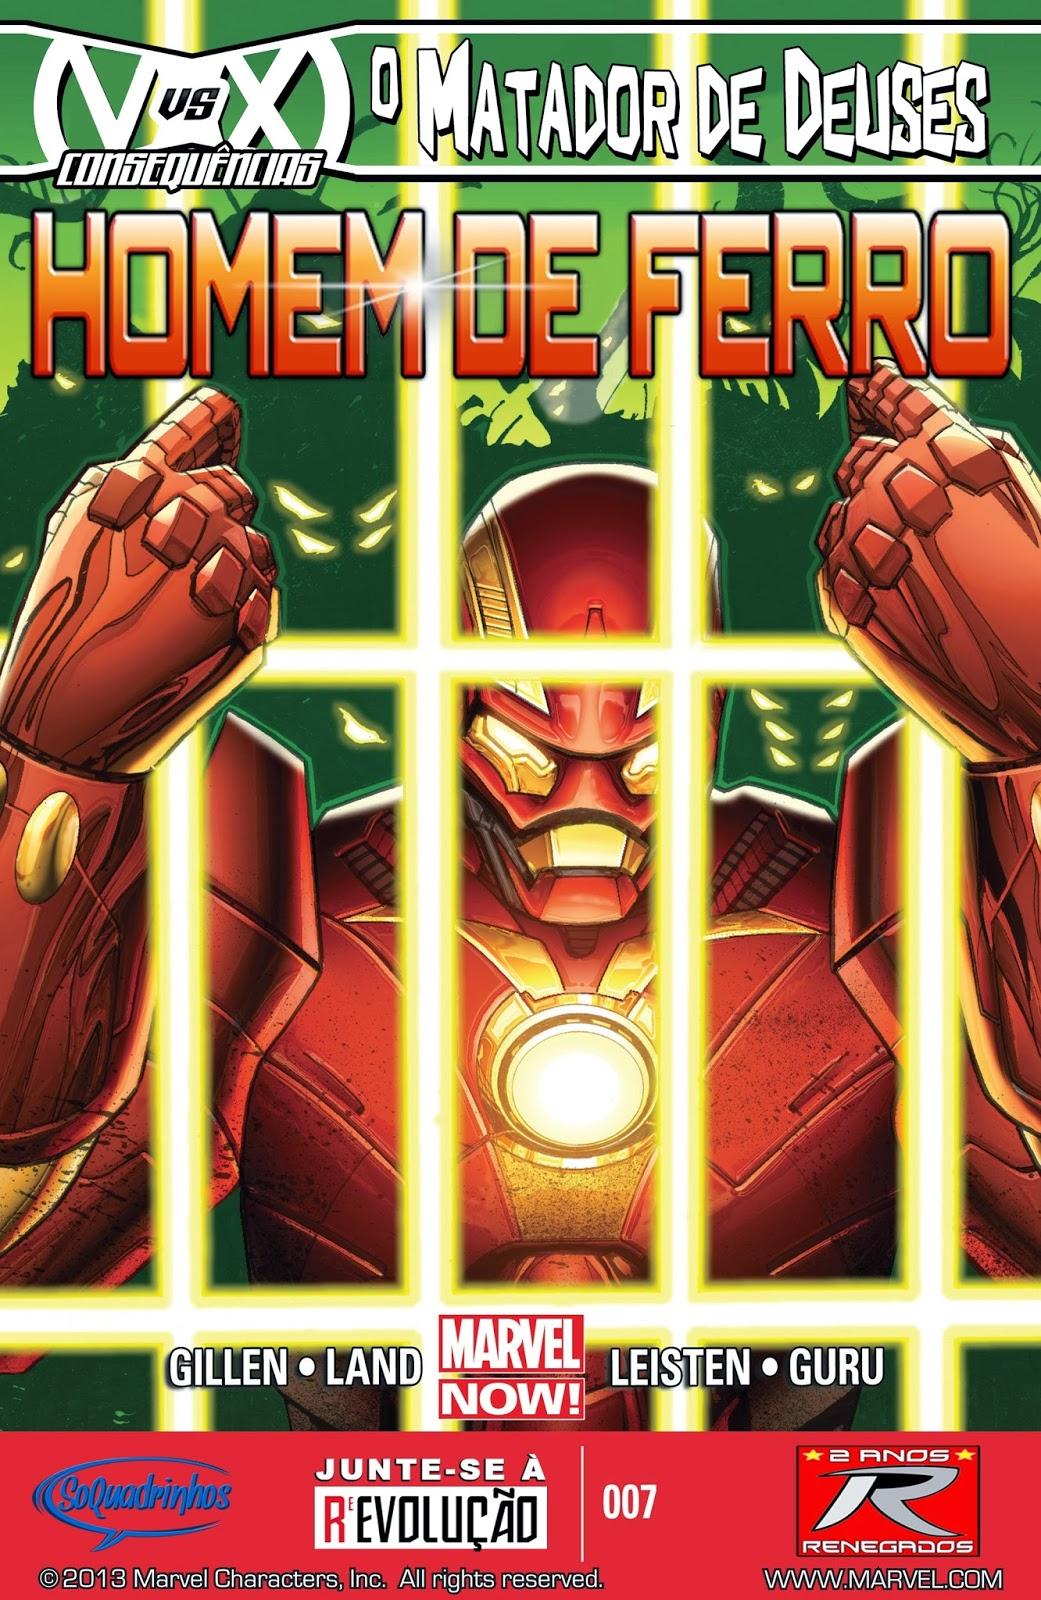 Nova Marvel! Homem de Ferro v6 #7